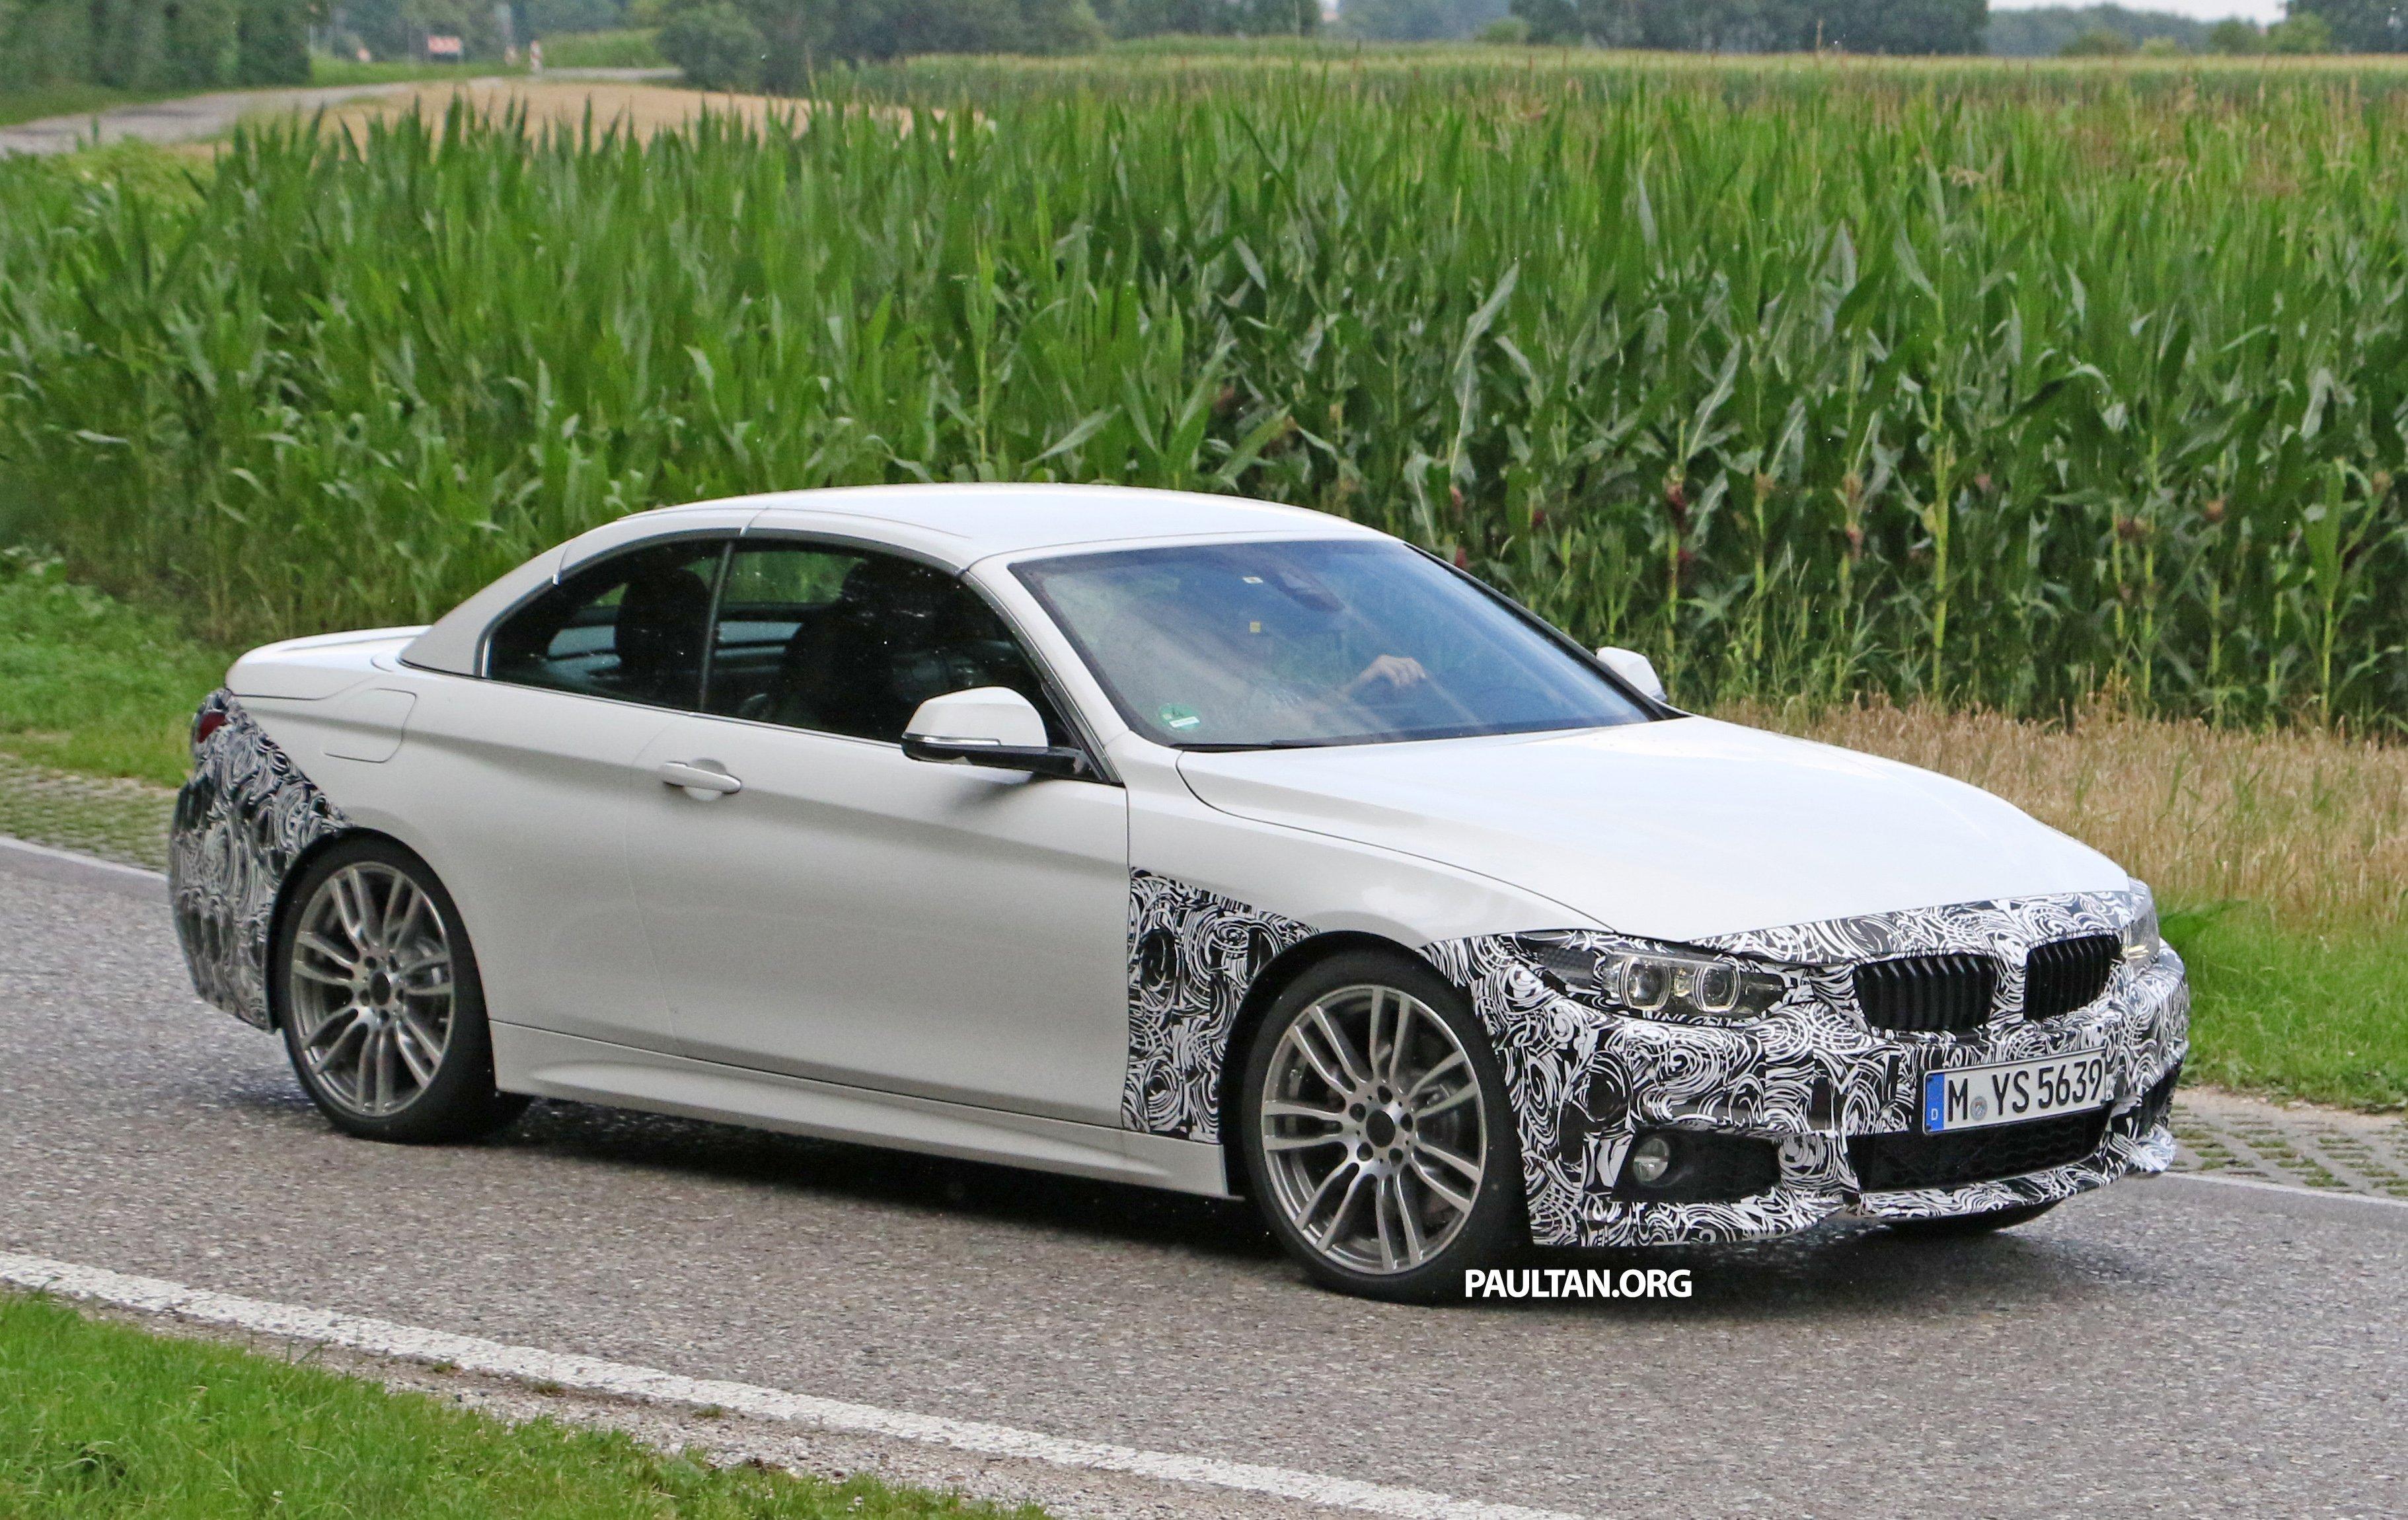 2018 Bmw 3 Series >> SPYSHOTS: F33 BMW 4 Series Convertible LCI spotted Paul Tan - Image 526918